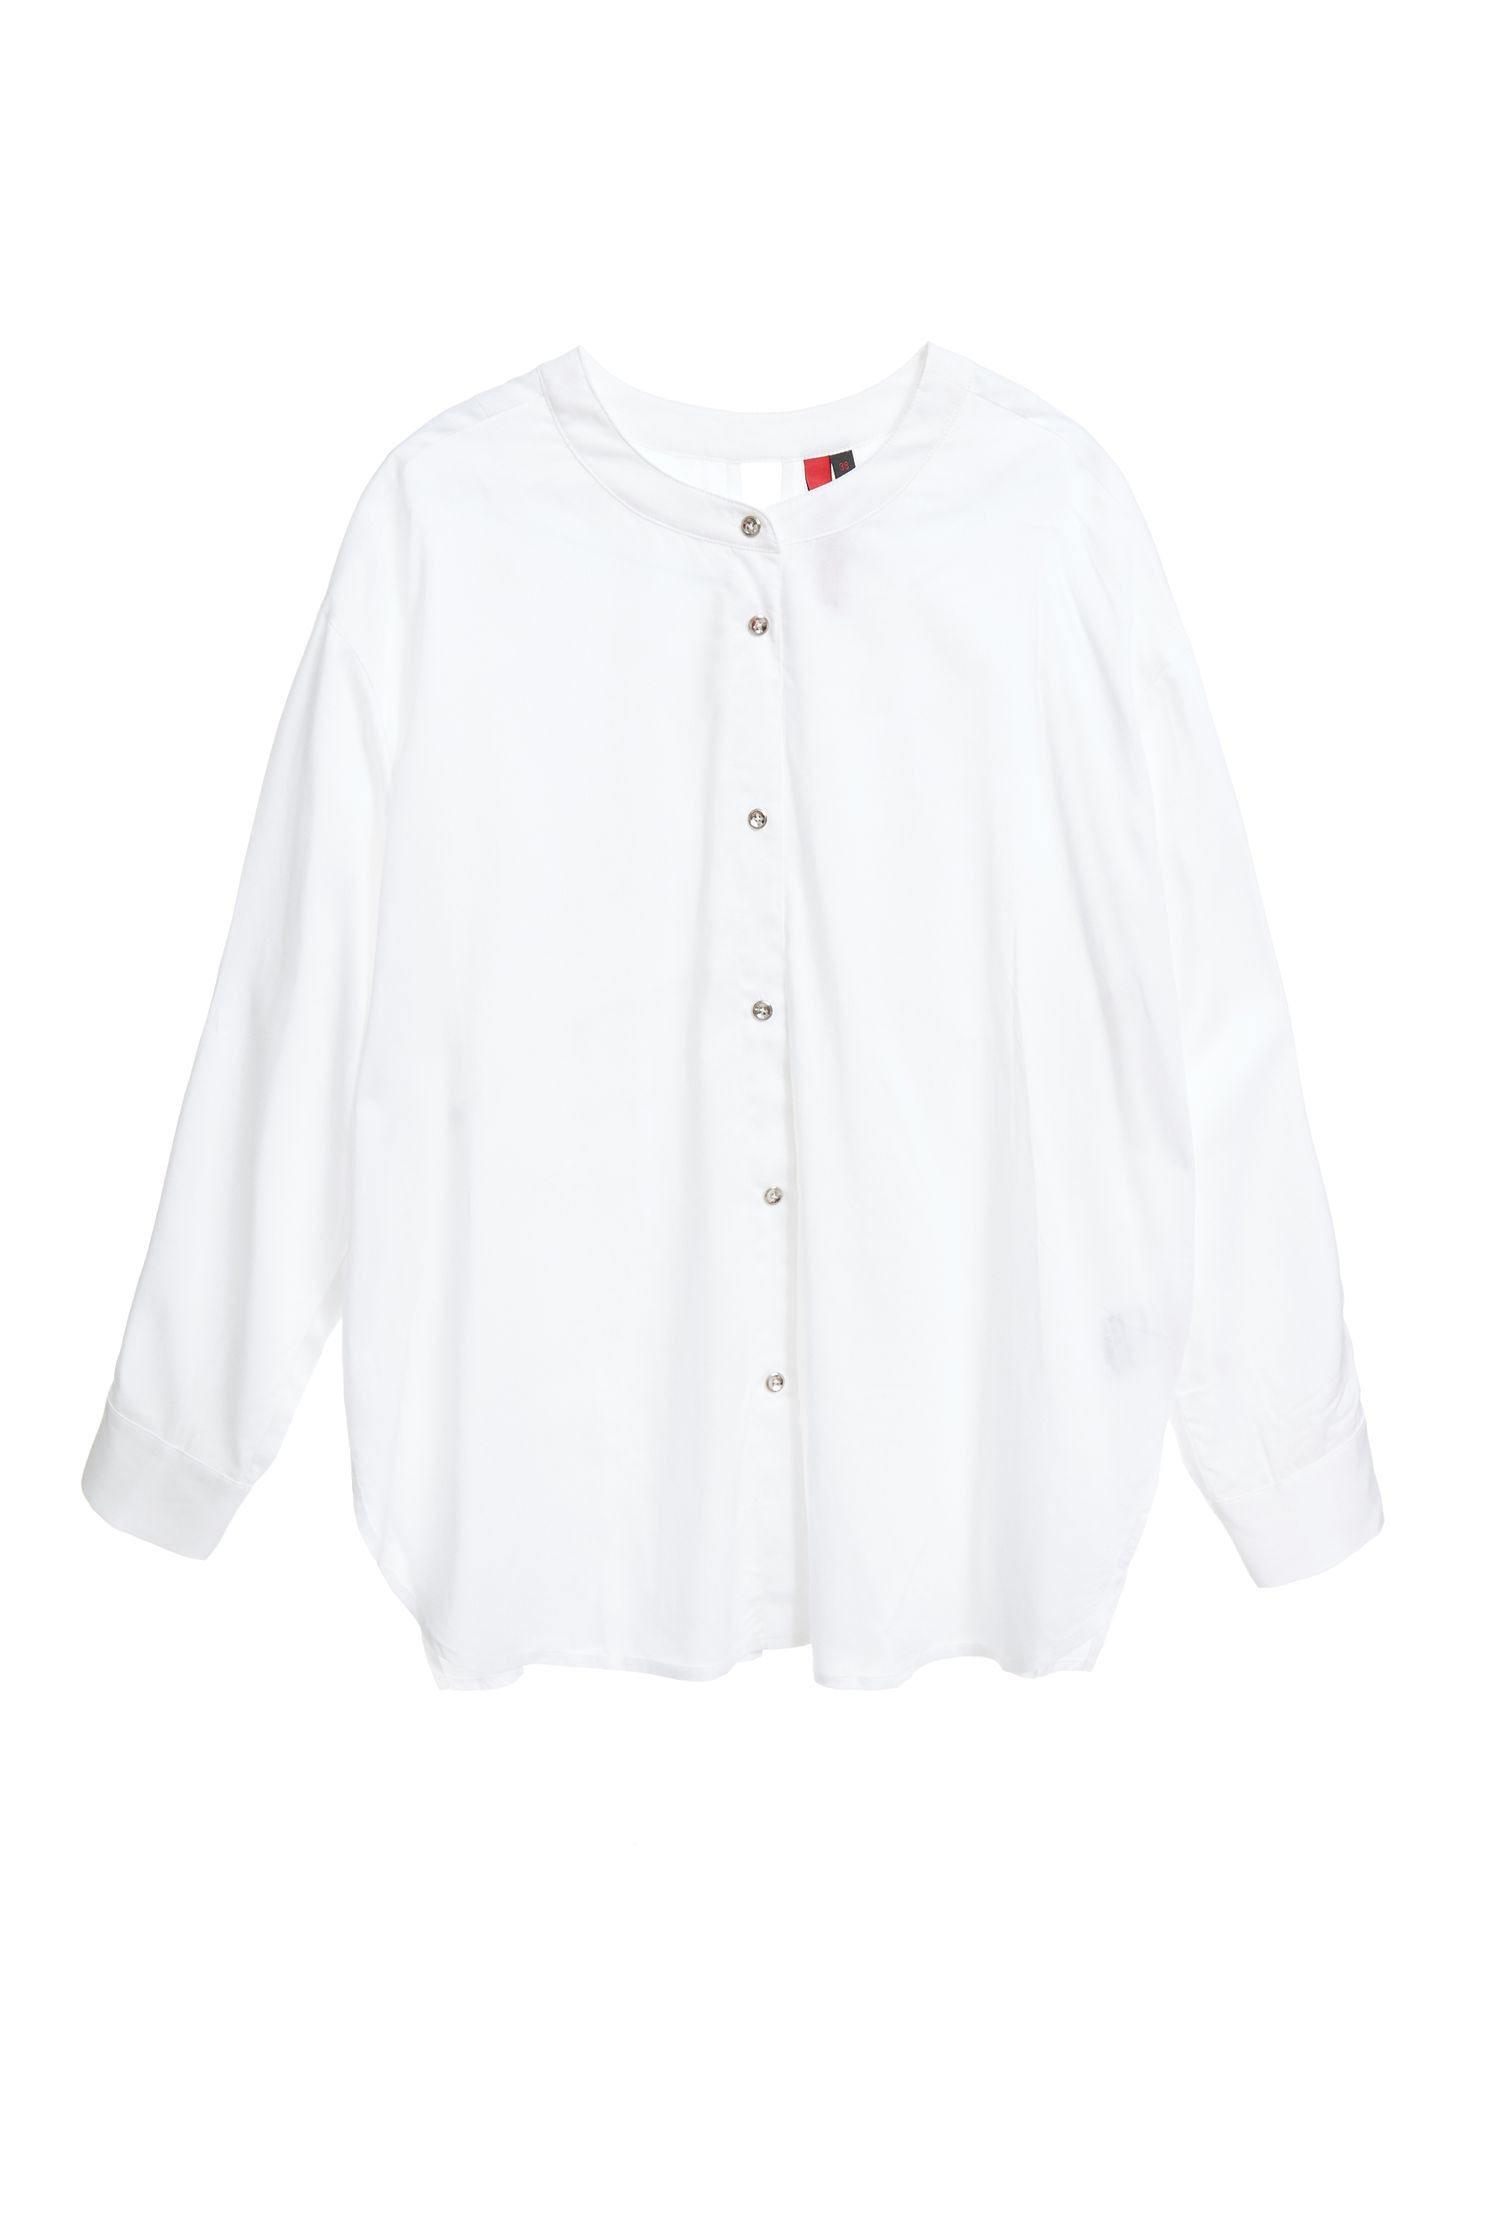 Flowing round-necked shirt,圓領上衣,白色上衣,Blouse,Long top,Long shirt,長袖上衣